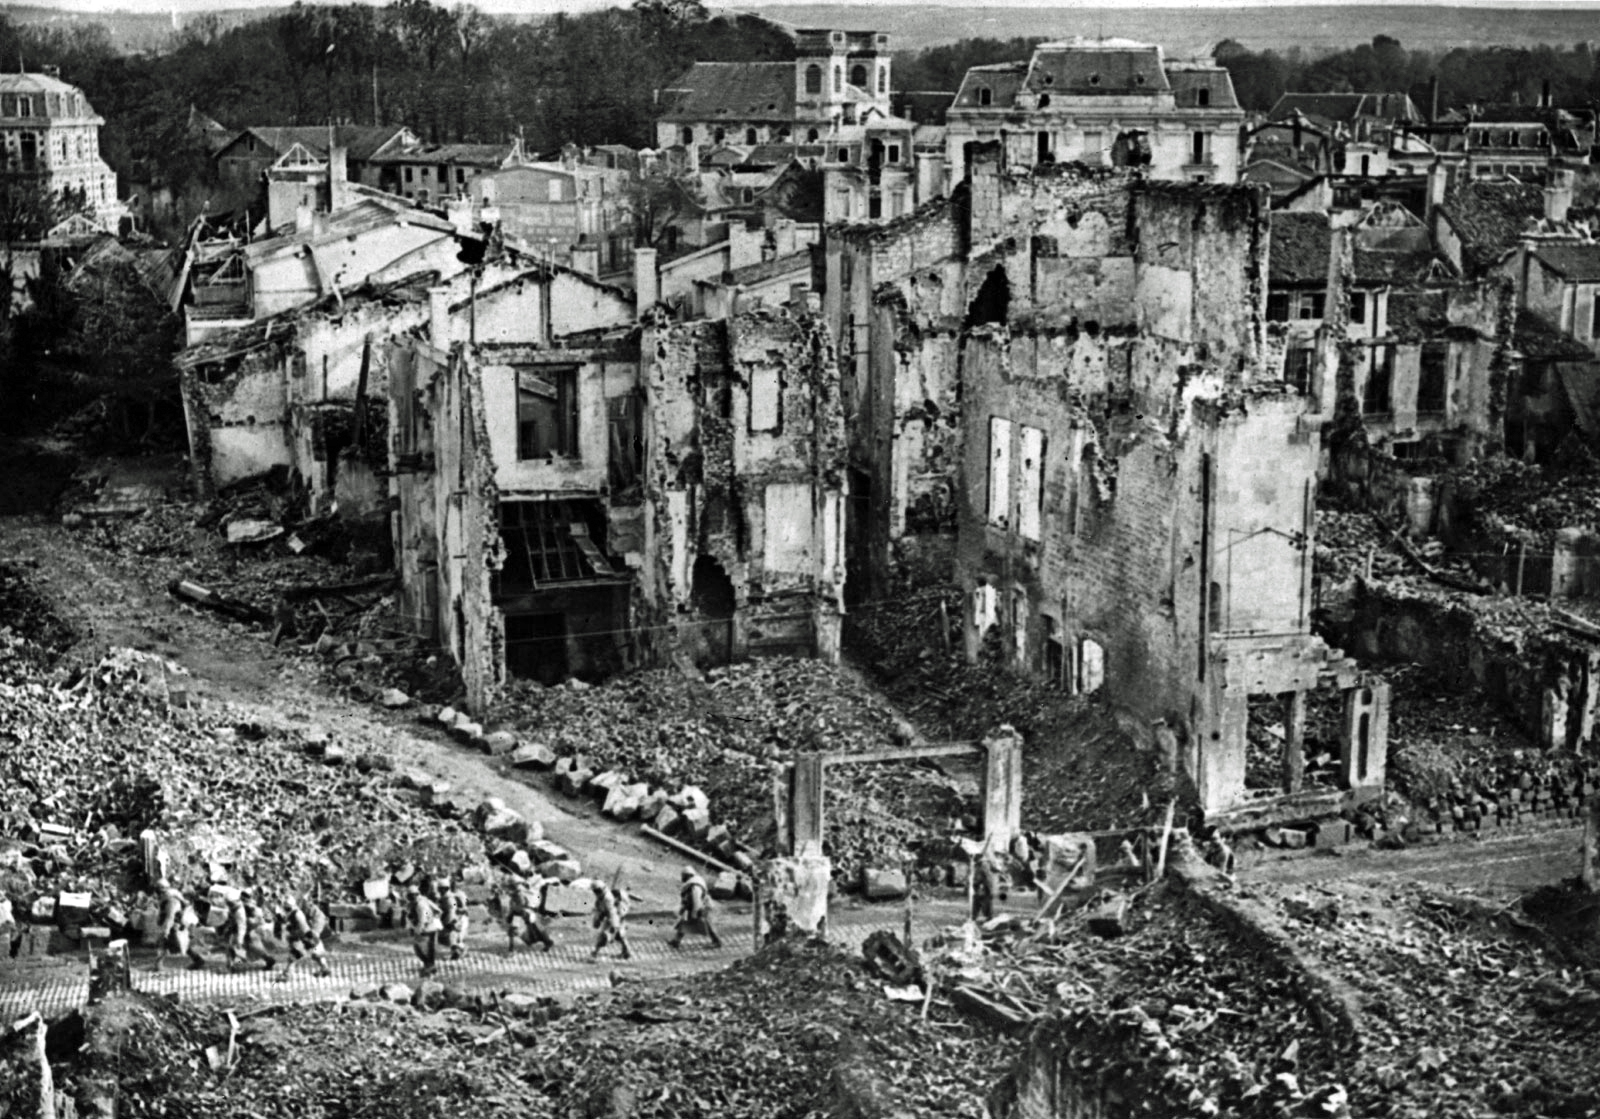 World War One destruction